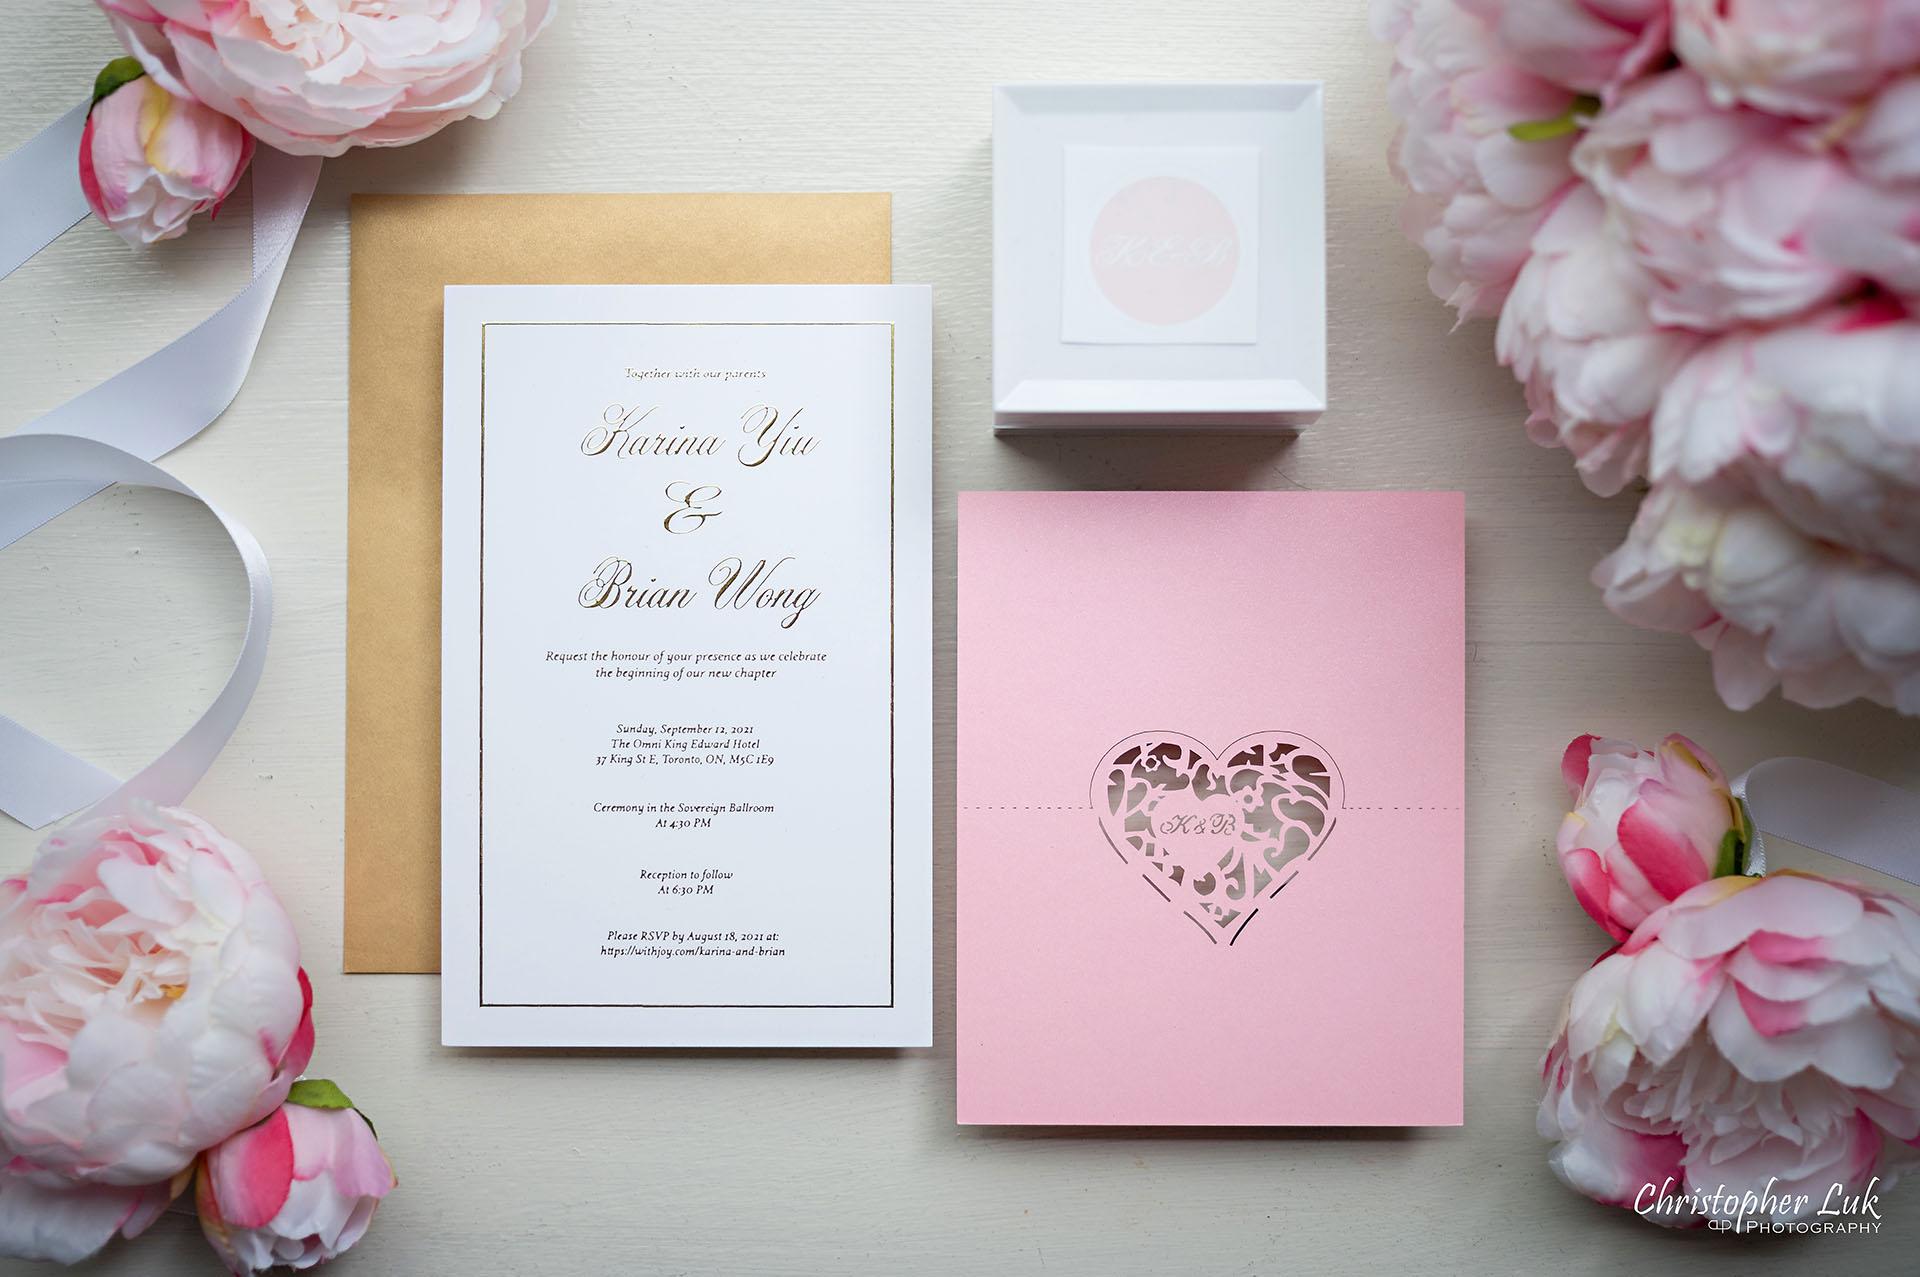 King Edward Hotel Crystal Ballroom Toronto Wedding Photographer MicroWedding Stationery Invitations Envelopes Laser Cut Heart Shape Ring Box Peonies Flowers Bouquets Flat Lay Flatlay Details